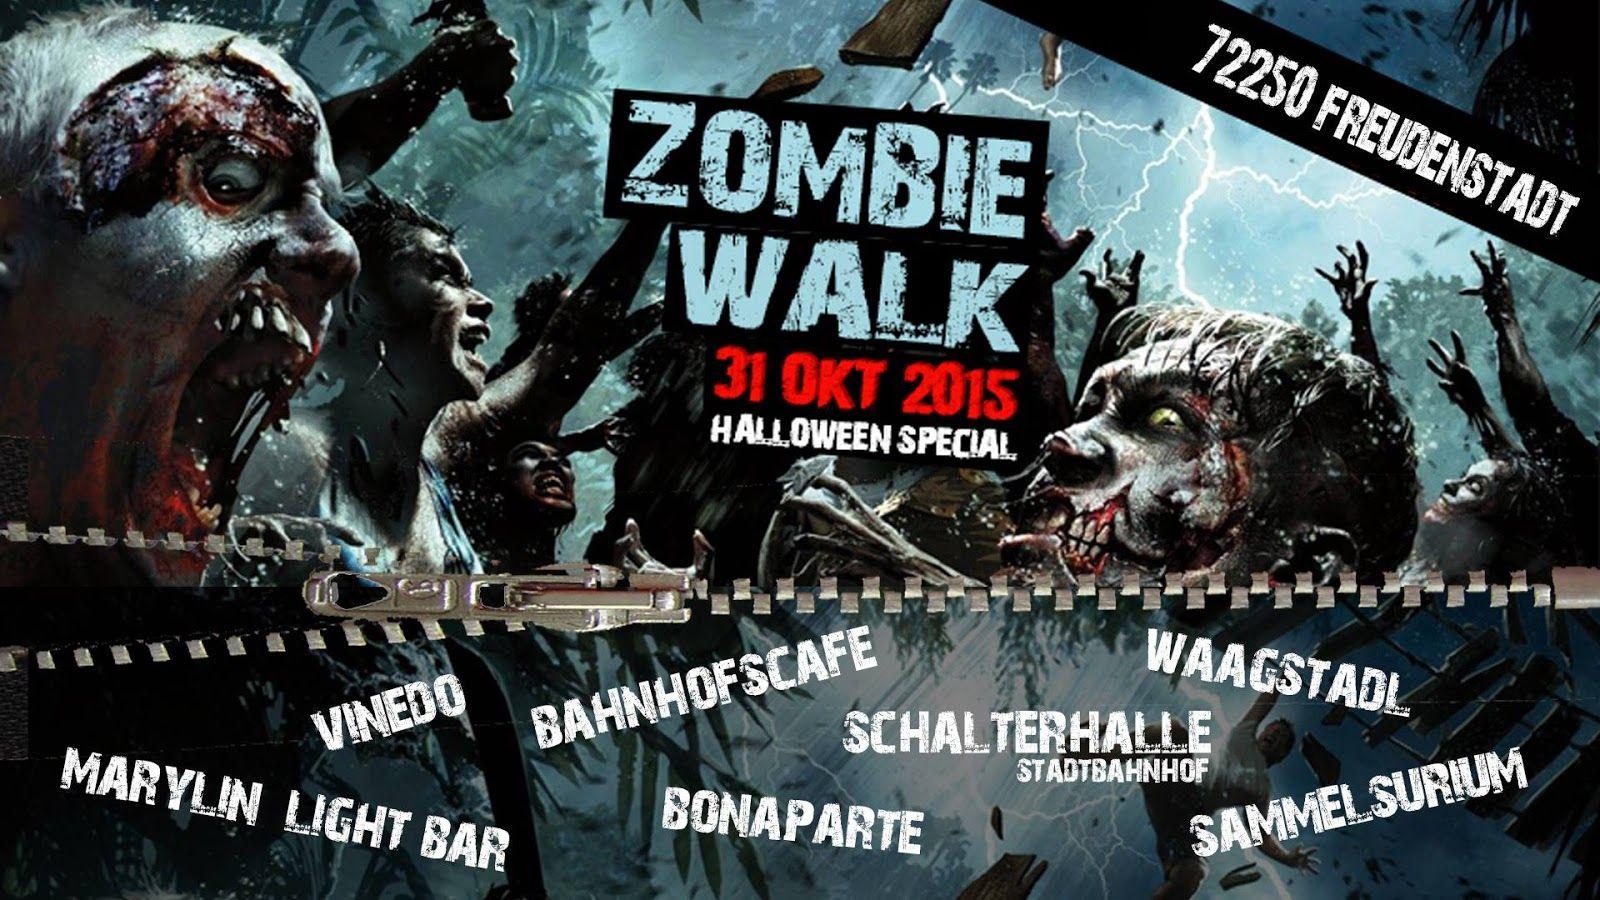 Zombie Walk - Halloween Special 2015 - Freudenstadt, Deutschland, 31. Oktober 2015